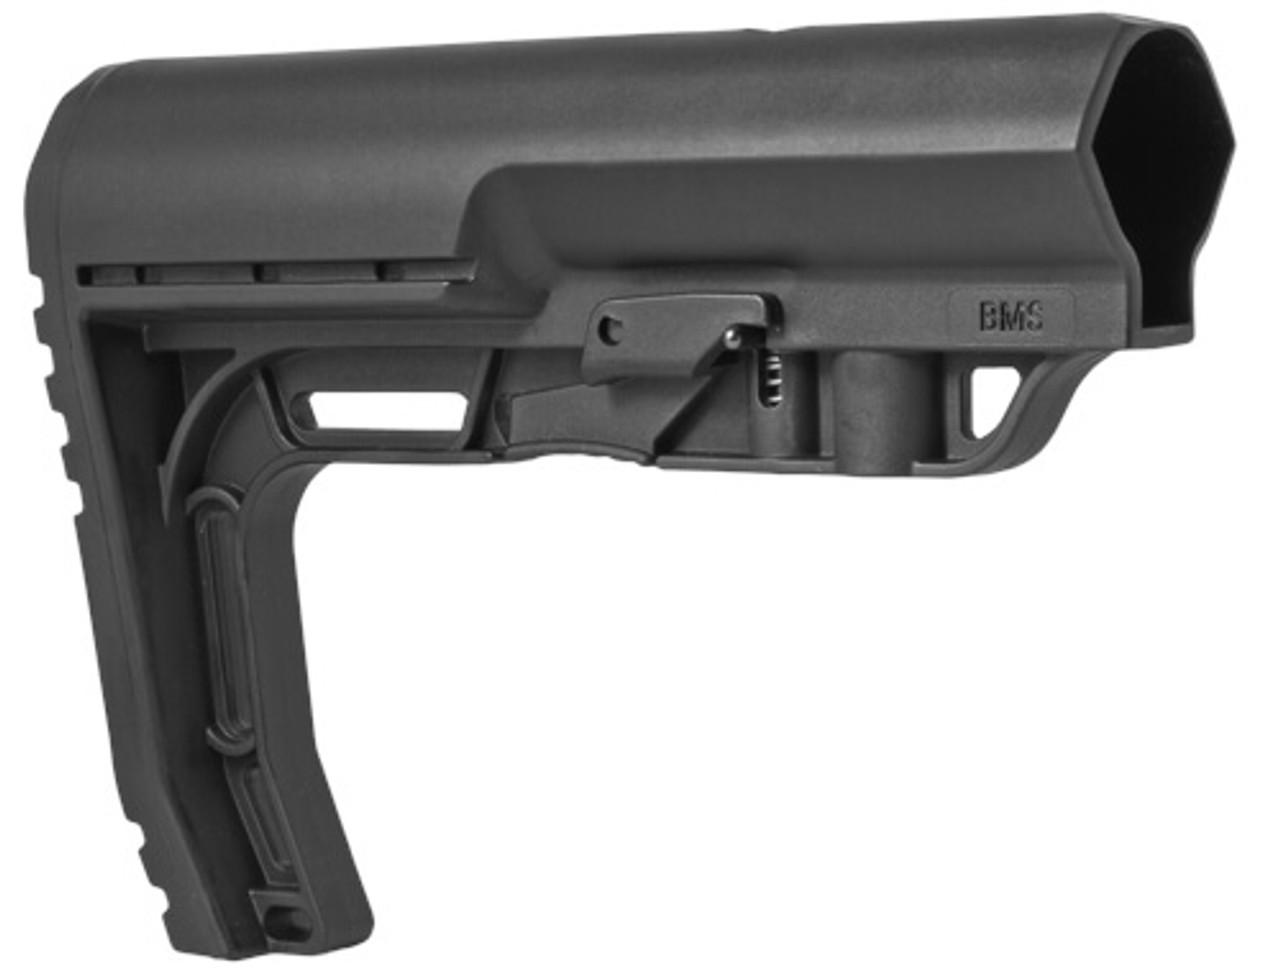 Mission First Tactical - Battlelink Minimalist Stock (Milspec/Black)